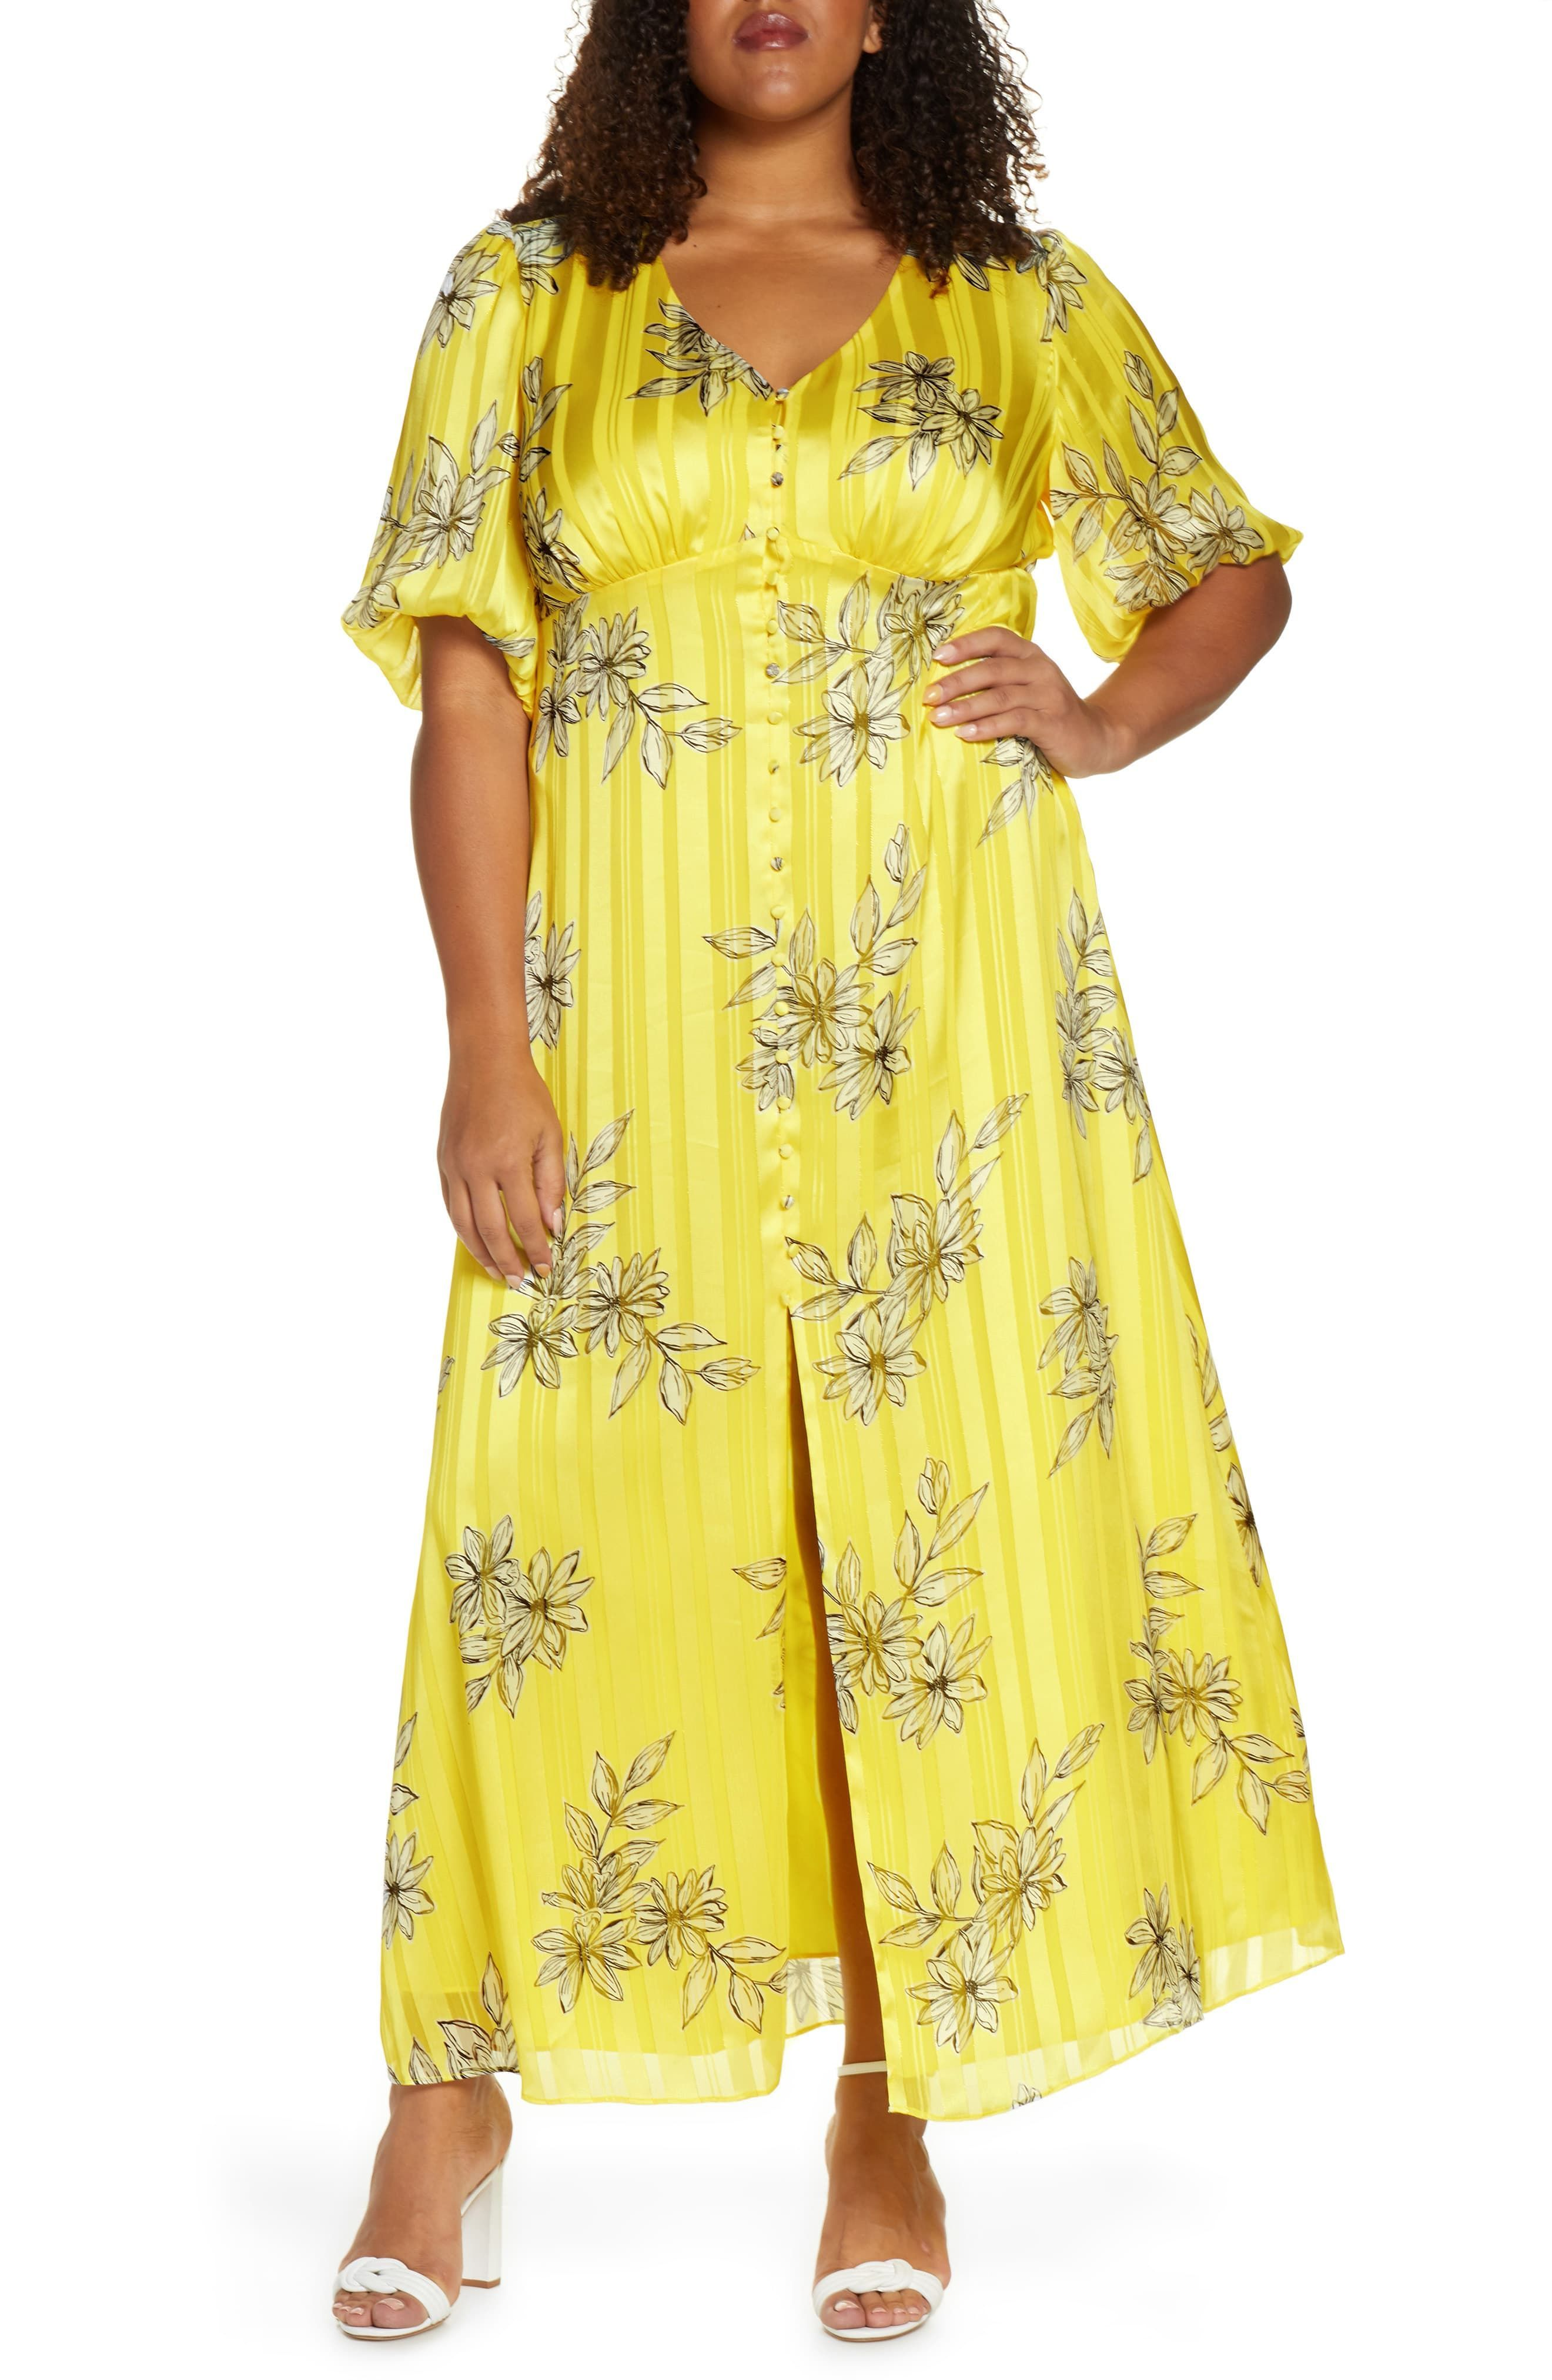 Plus Size Women S Maree Pour Toi Floral Metallic Stripe Button Front Maxi Dress Size 24w Yellow Sou In 2020 Plus Size Dresses Plus Size Maxi Dresses Maxi Dress [ 4048 x 2640 Pixel ]